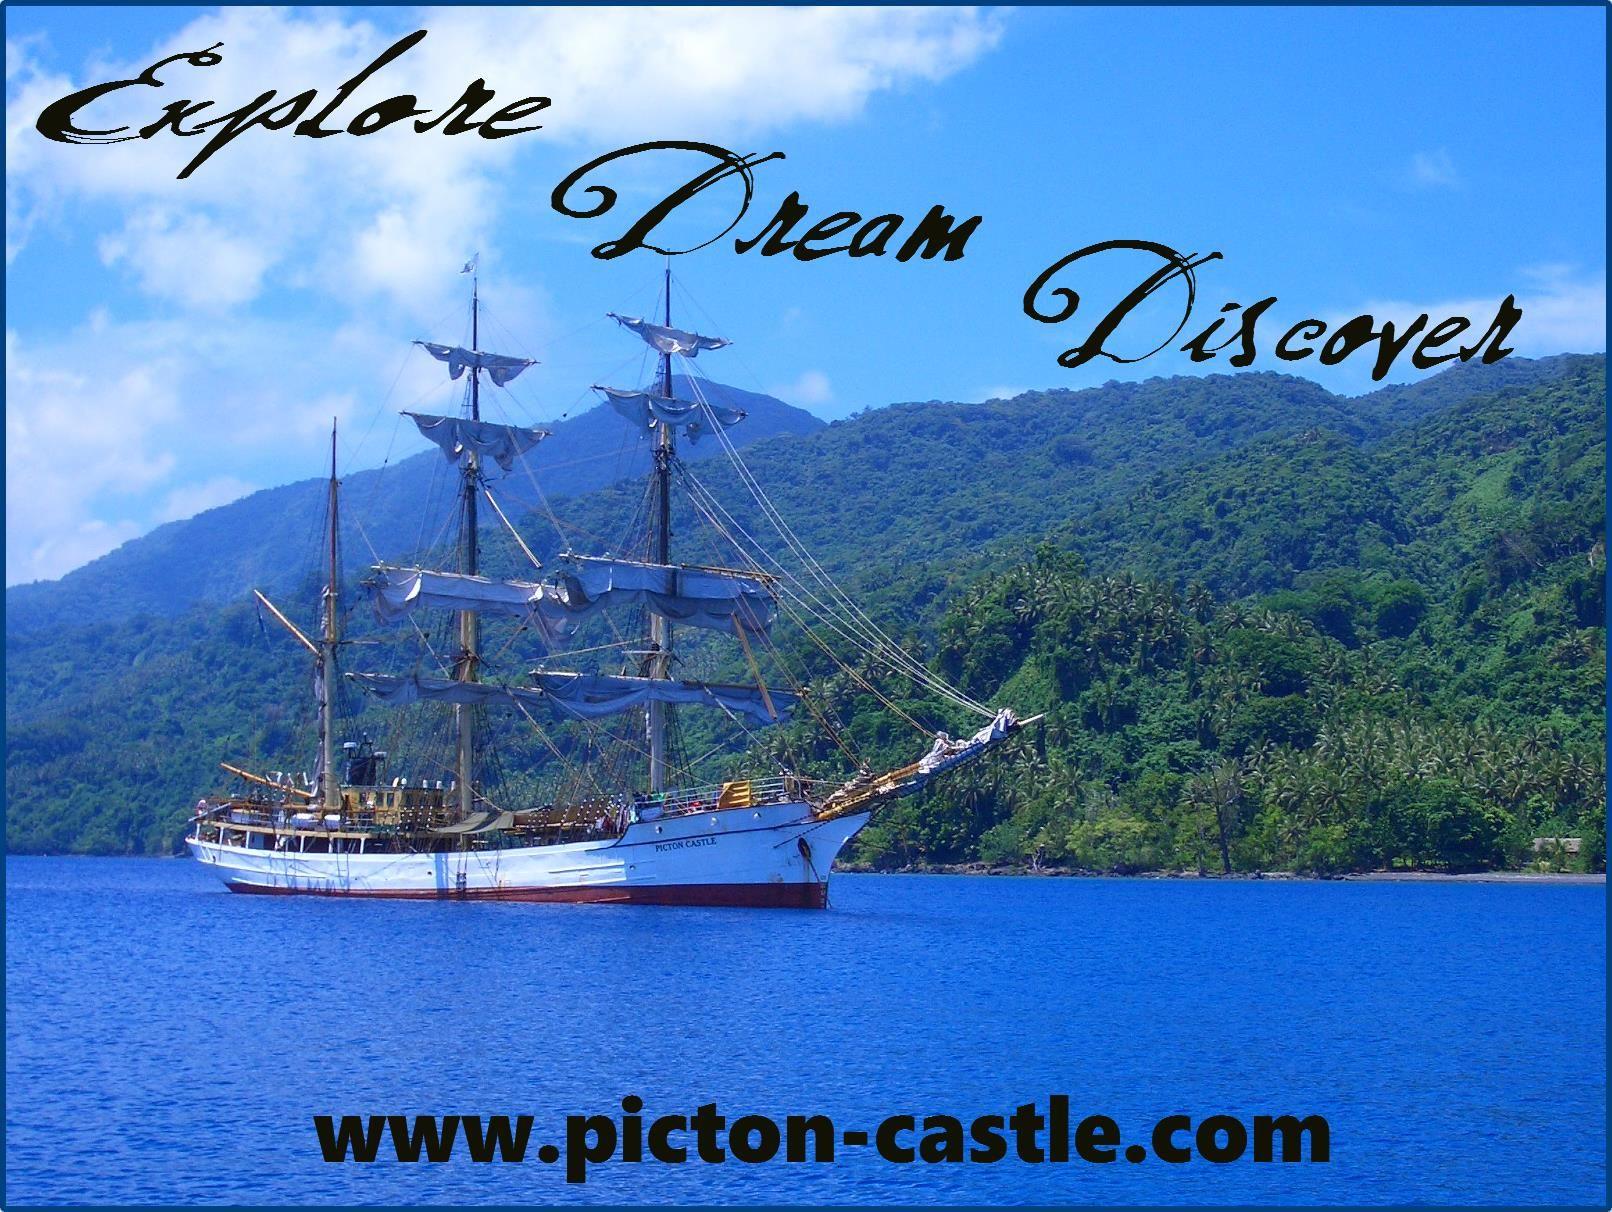 Ship Quotes Explore Dream Discover  Tall Ship Sailing Tallship Sailing